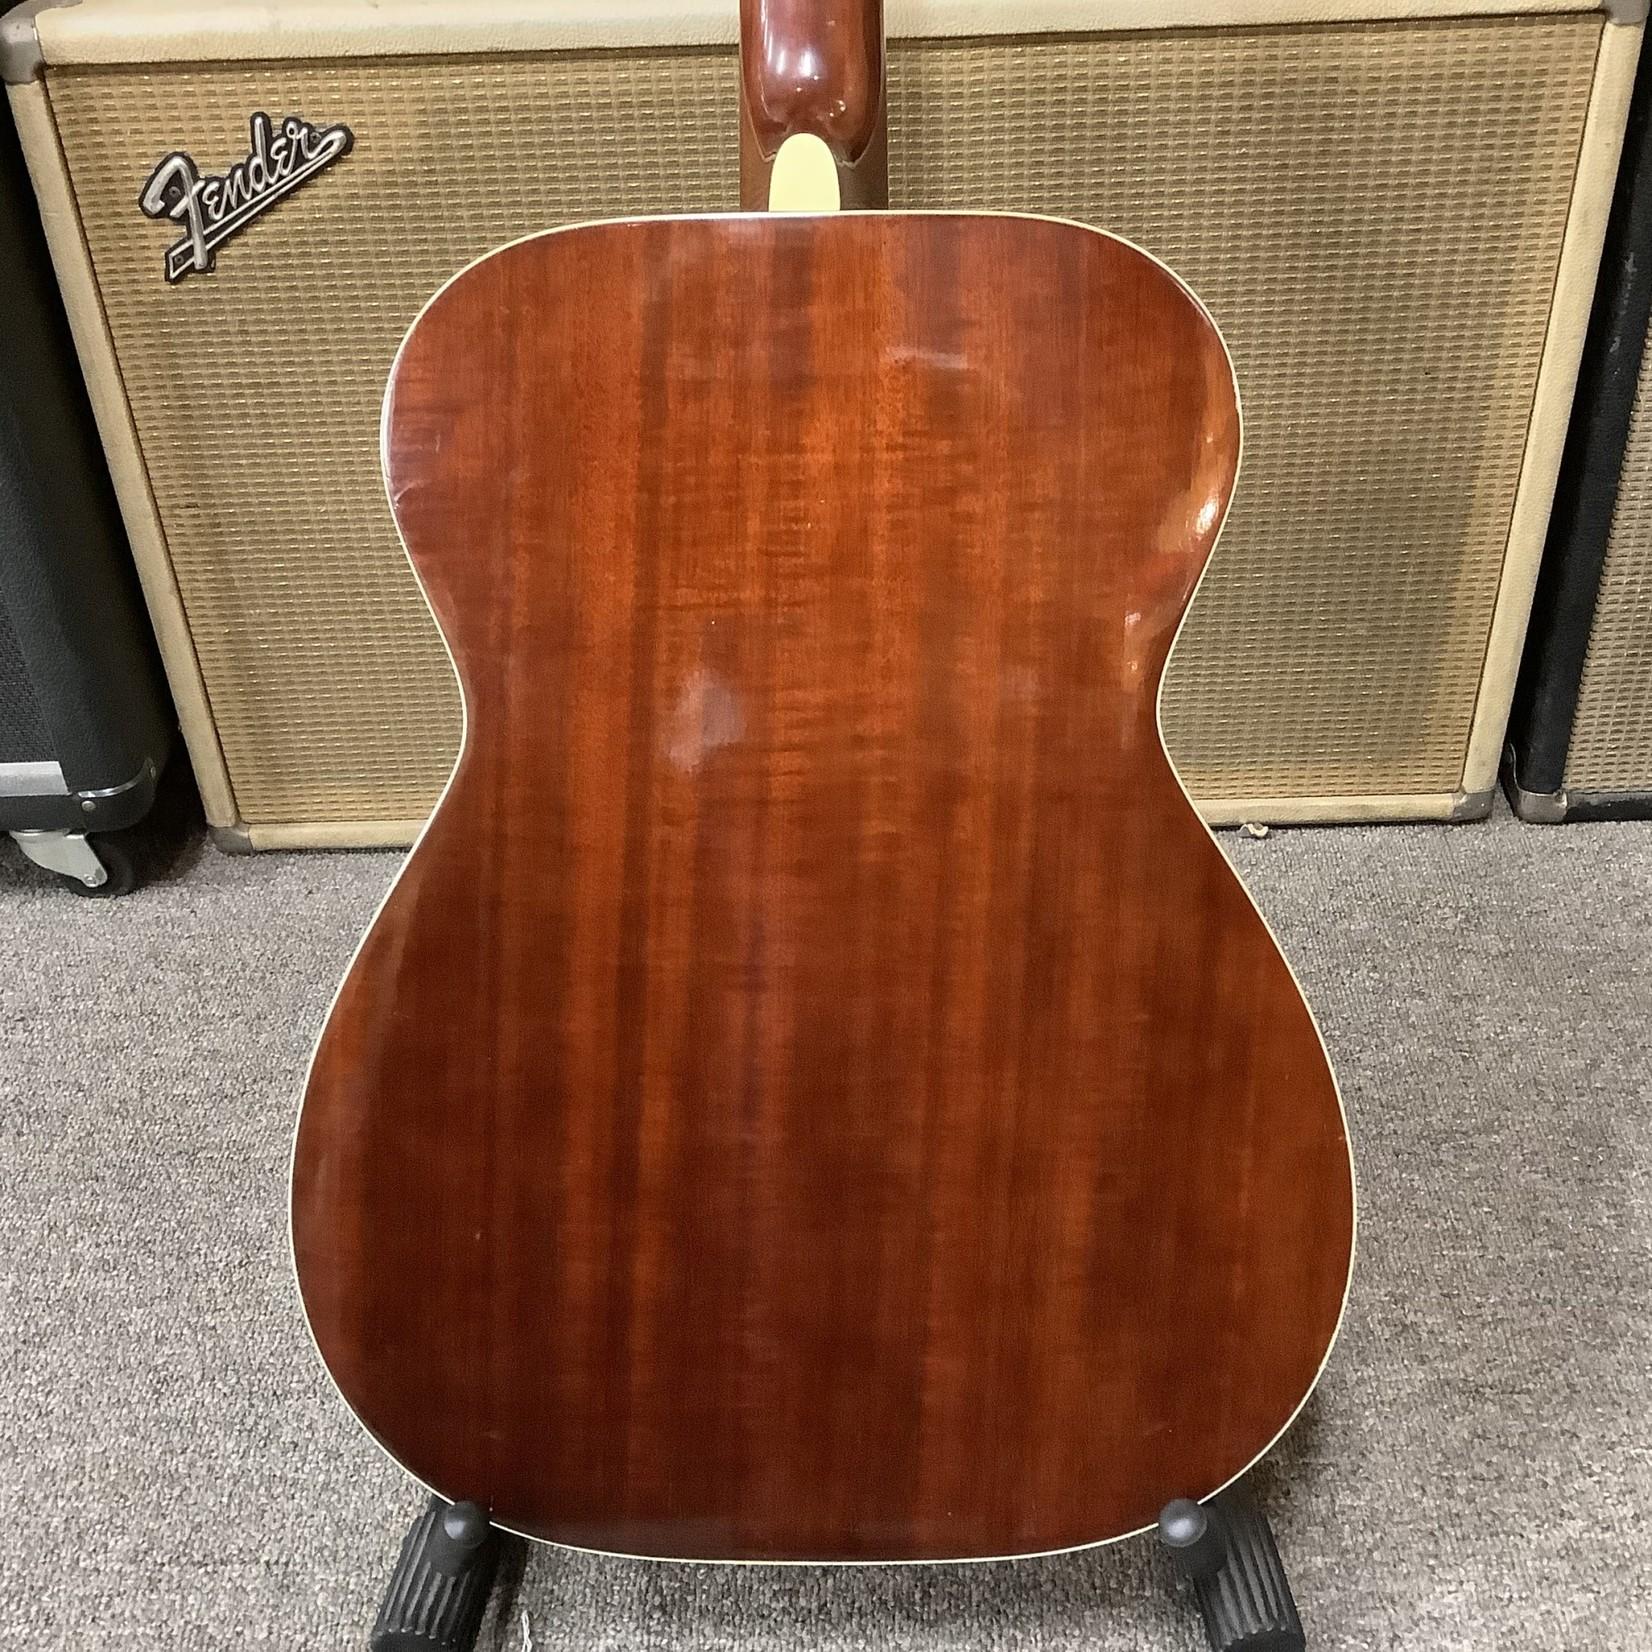 Harmony 1960's Harmony H168 On-One-Side Tuners